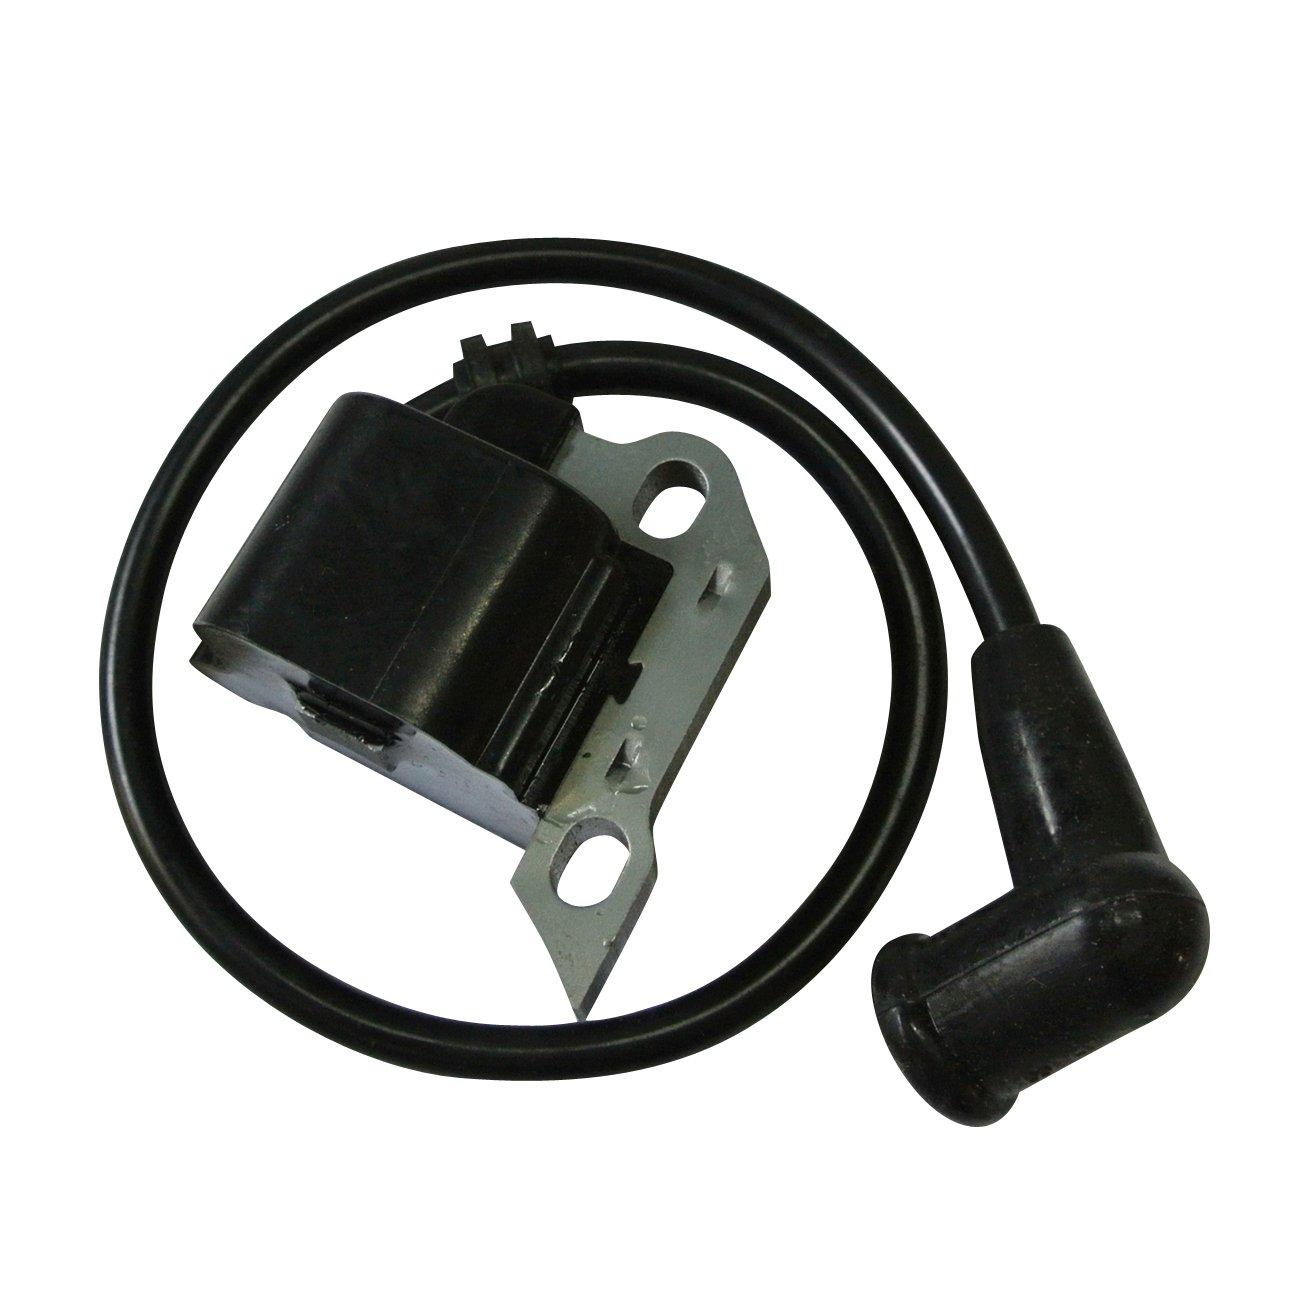 Ruichang bobina d' accensione modulo Parts Fit Stihl SR320 340 380 420 BR320 340 soffiatore RuichangTools&Parts